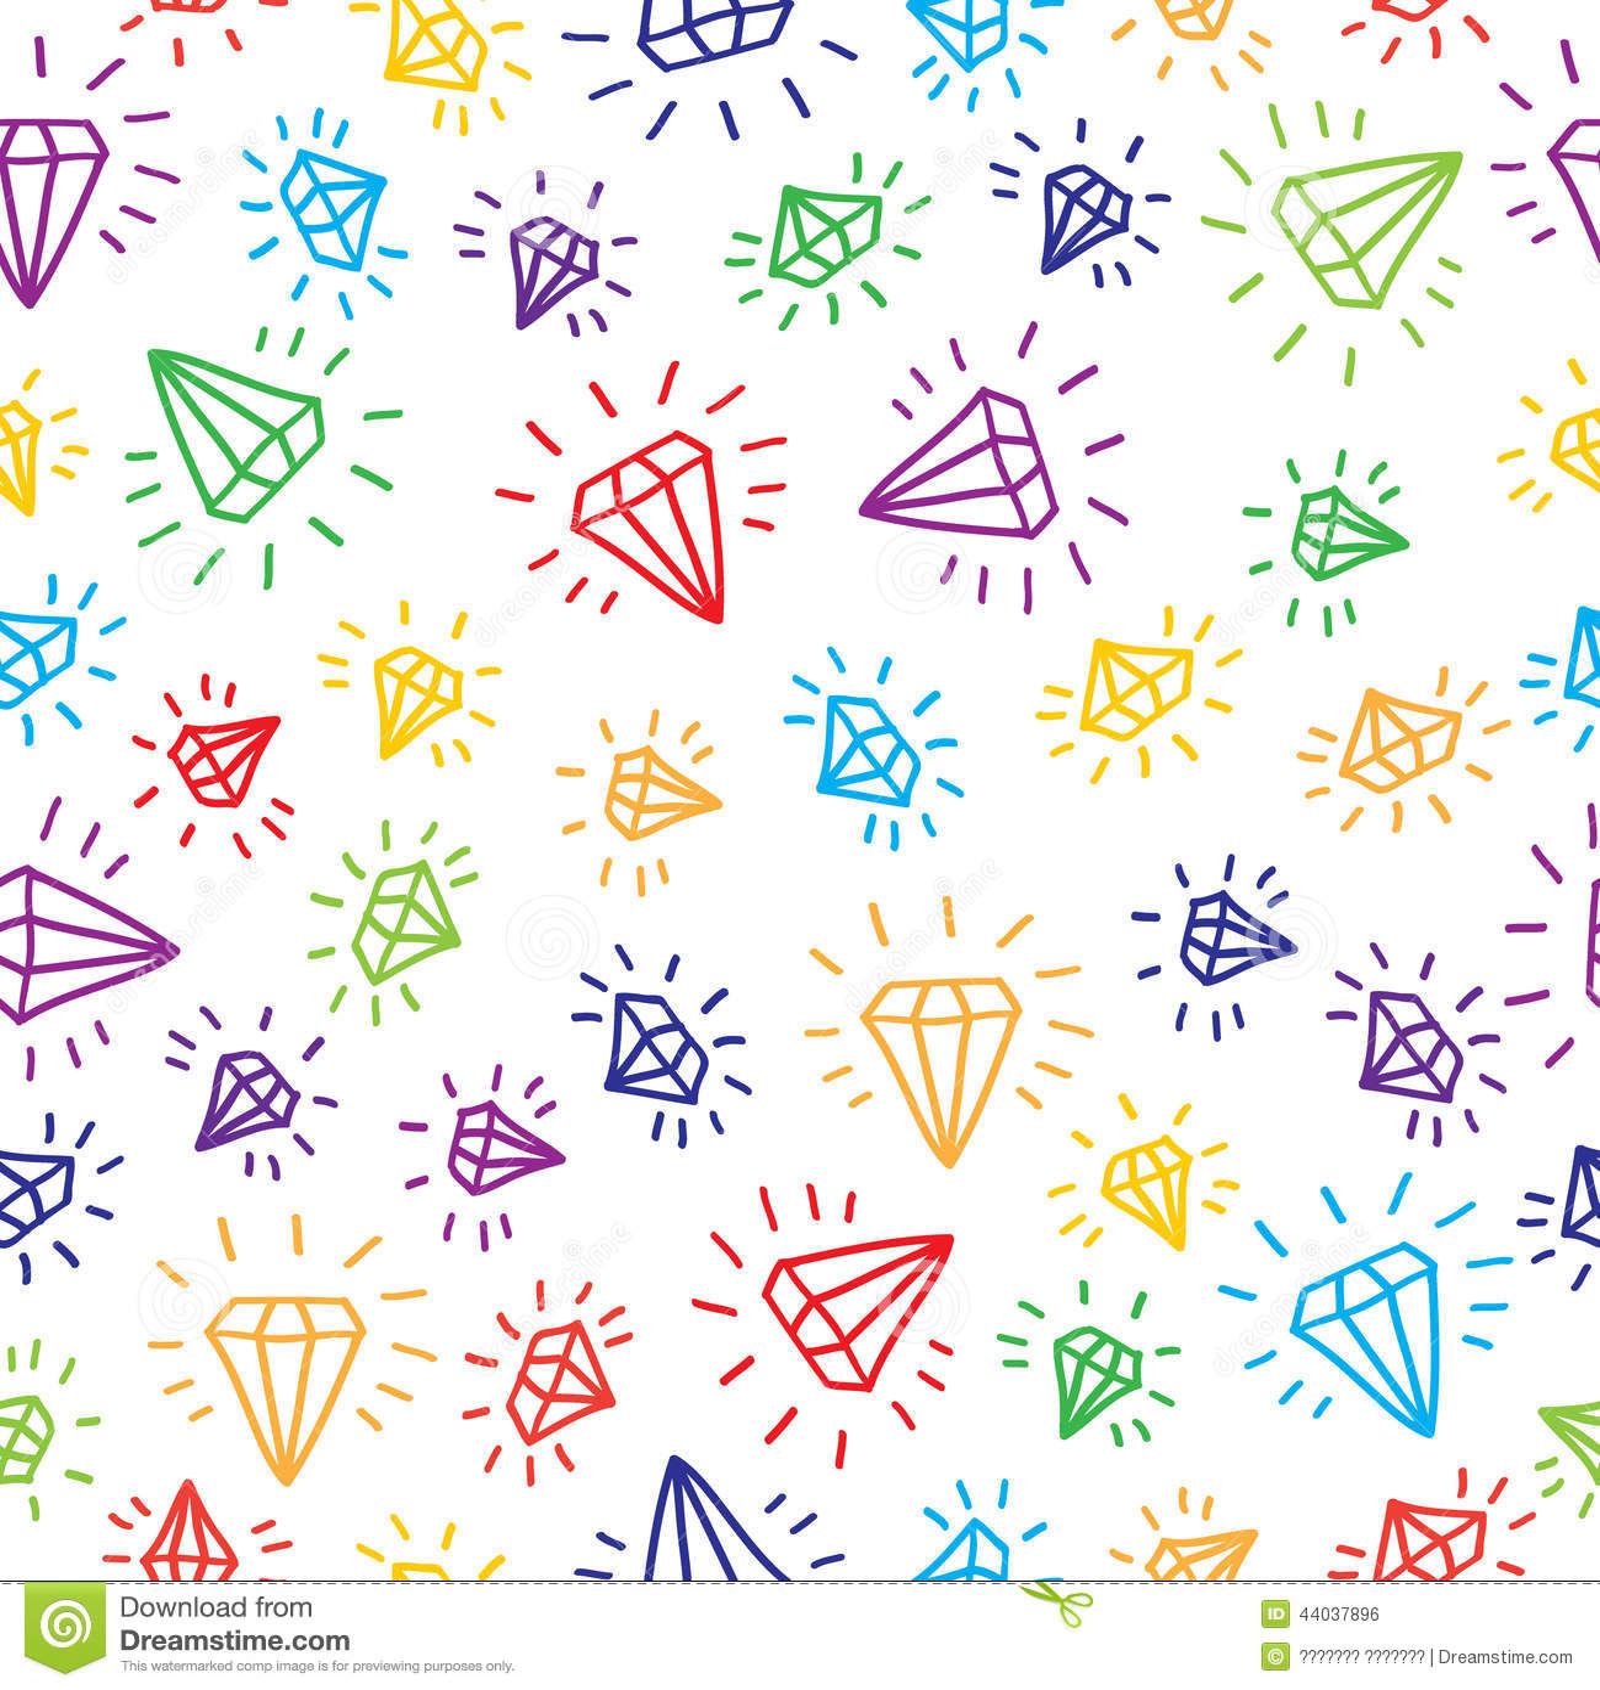 Black And White Wallpaper Iphone 6 Cute Cartoon Diamond Seamless Vector Background Stock Vector